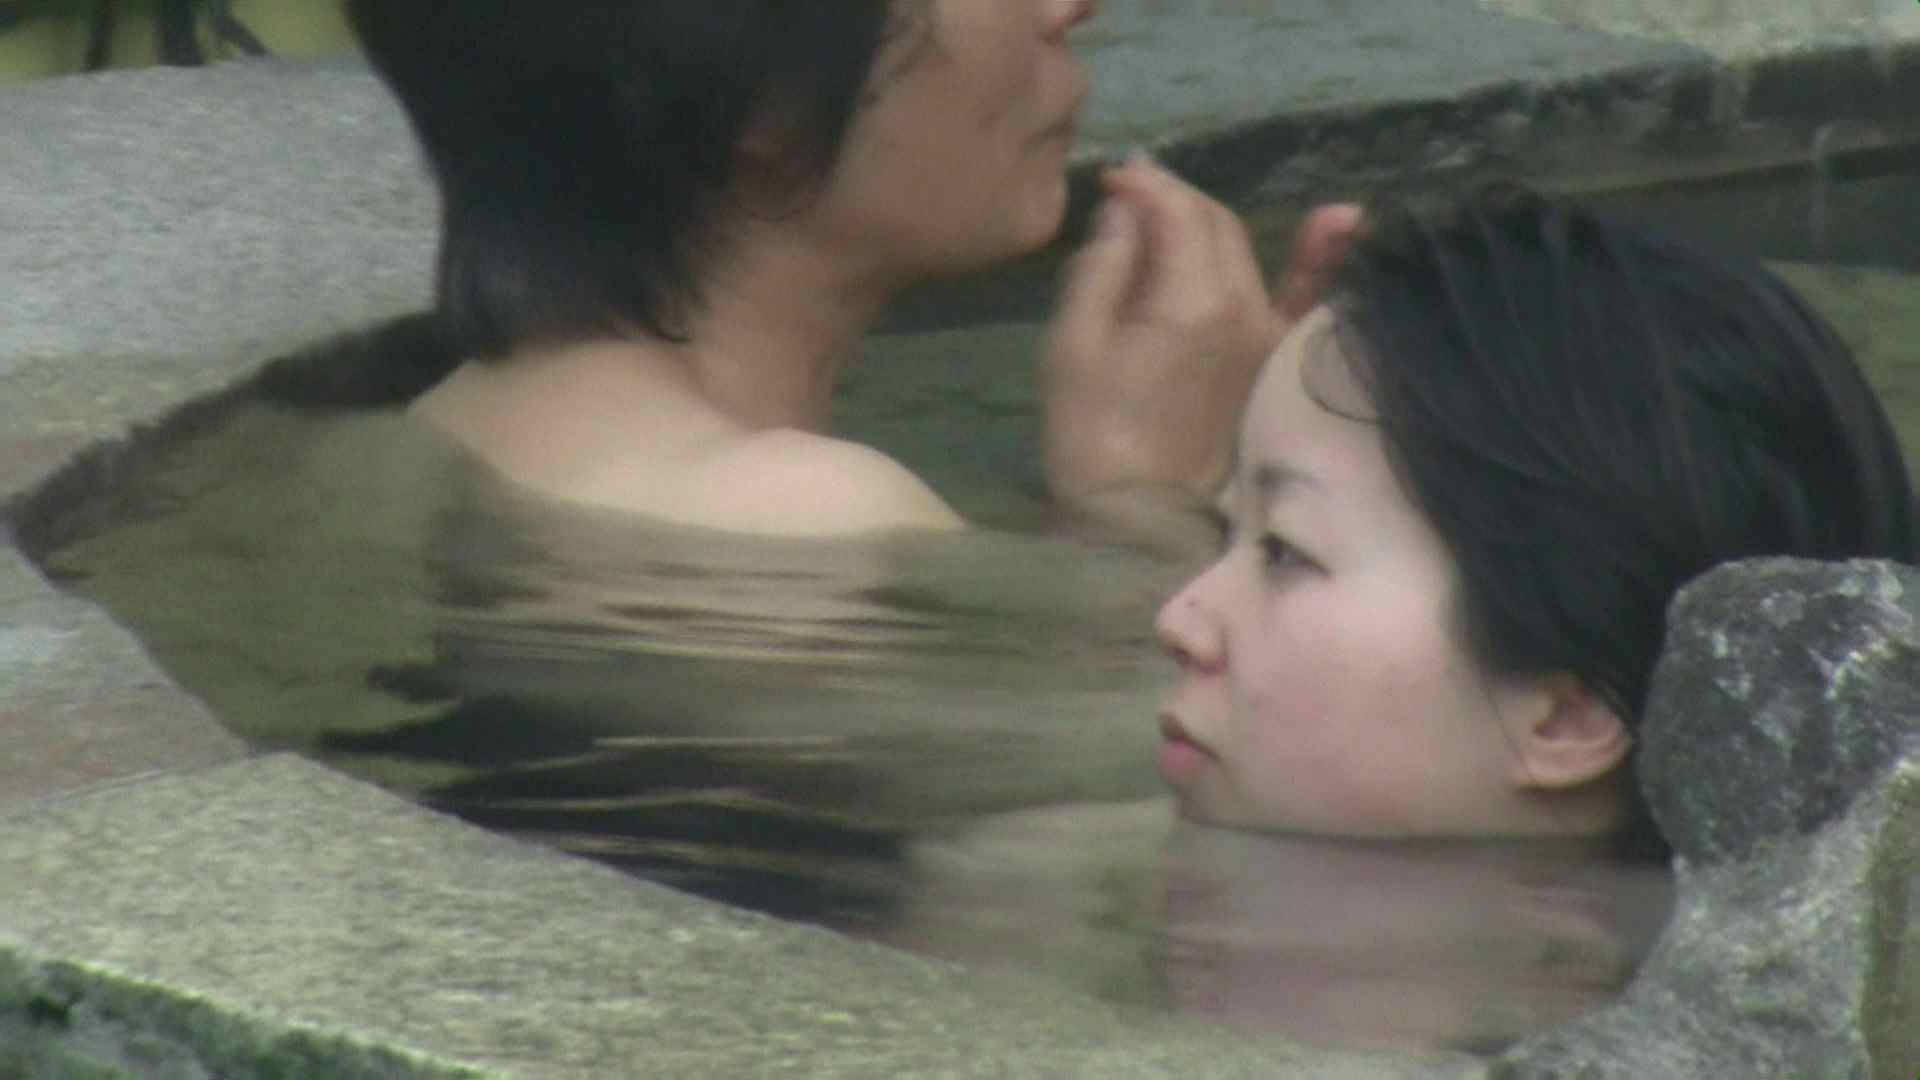 Aquaな露天風呂Vol.06【VIP】 盗撮 | OLエロ画像  113PICs 40